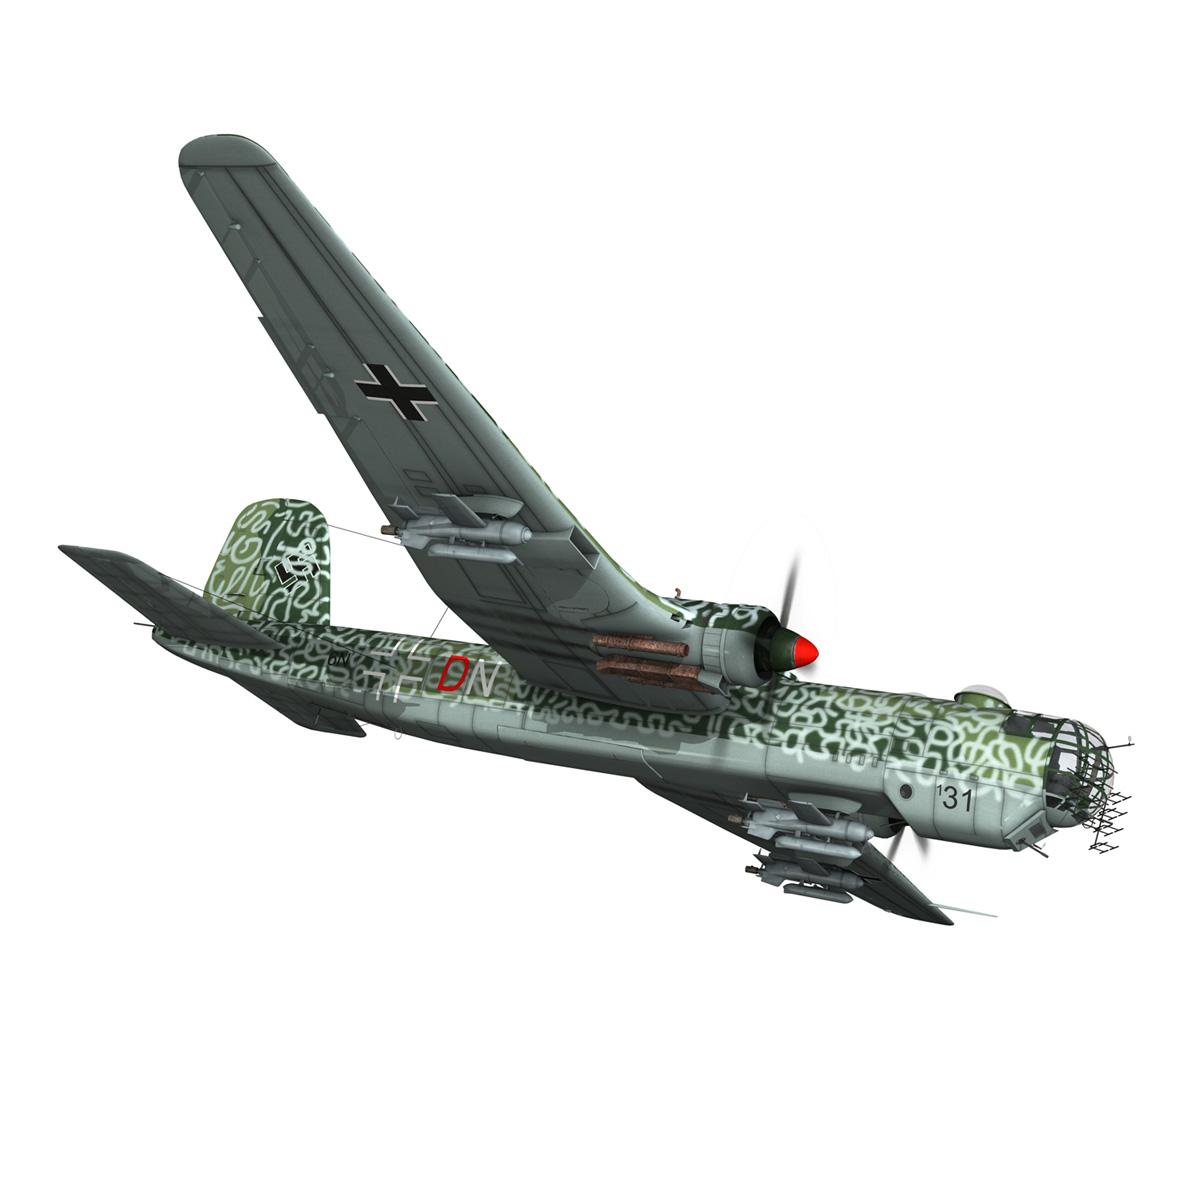 heinkel he-177 a-5 – greif – 6ndn 3d model 3ds fbx c4d lwo obj 201592